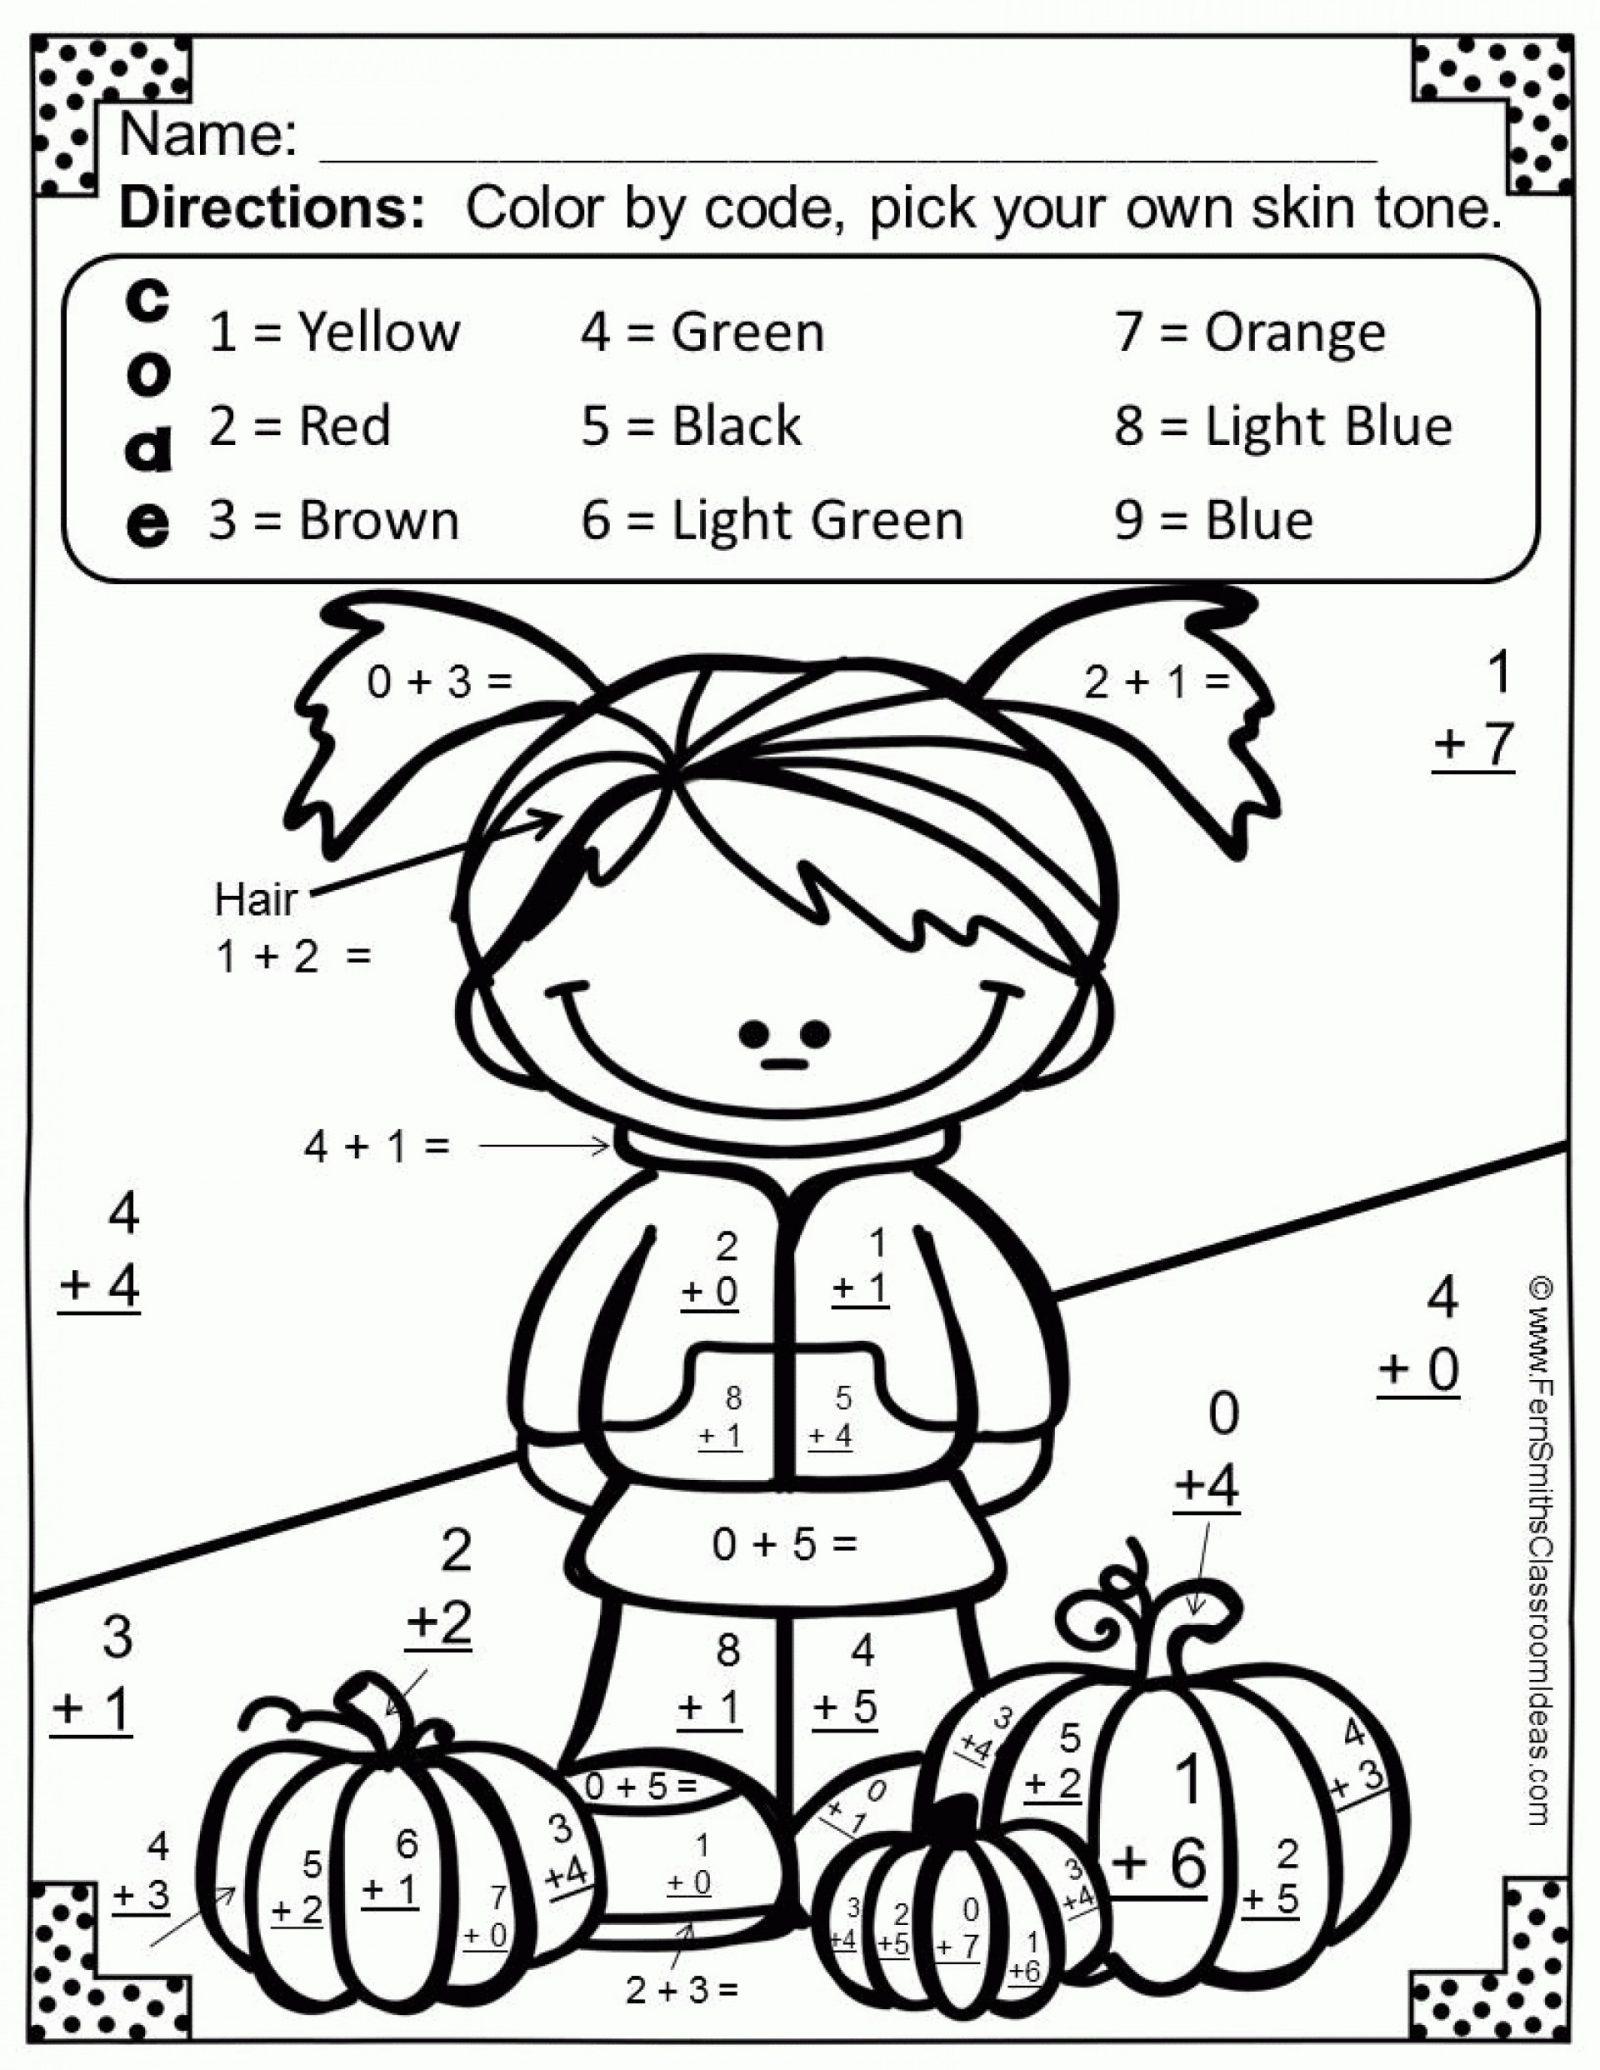 2Nd Grade Math Worksheets: Kids Worksheet Solve For And Fun inside Printable Halloween Multiplication Worksheets